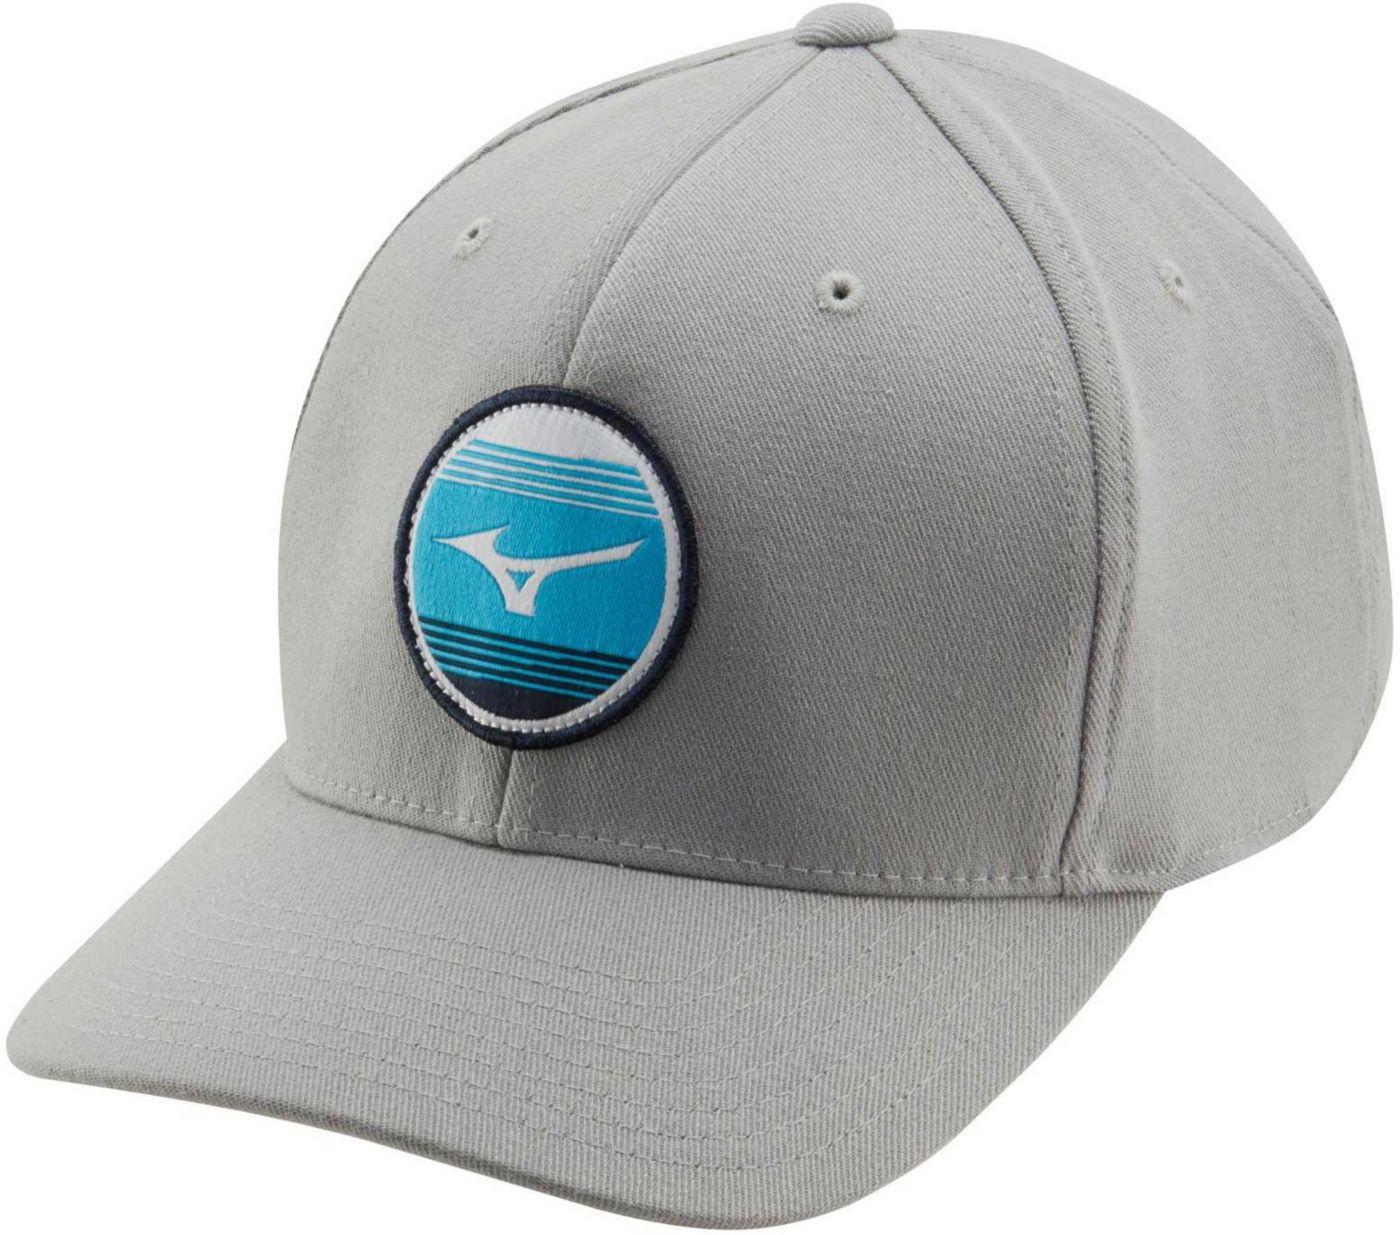 Mizuno Men's 919 Snapback Golf Hat